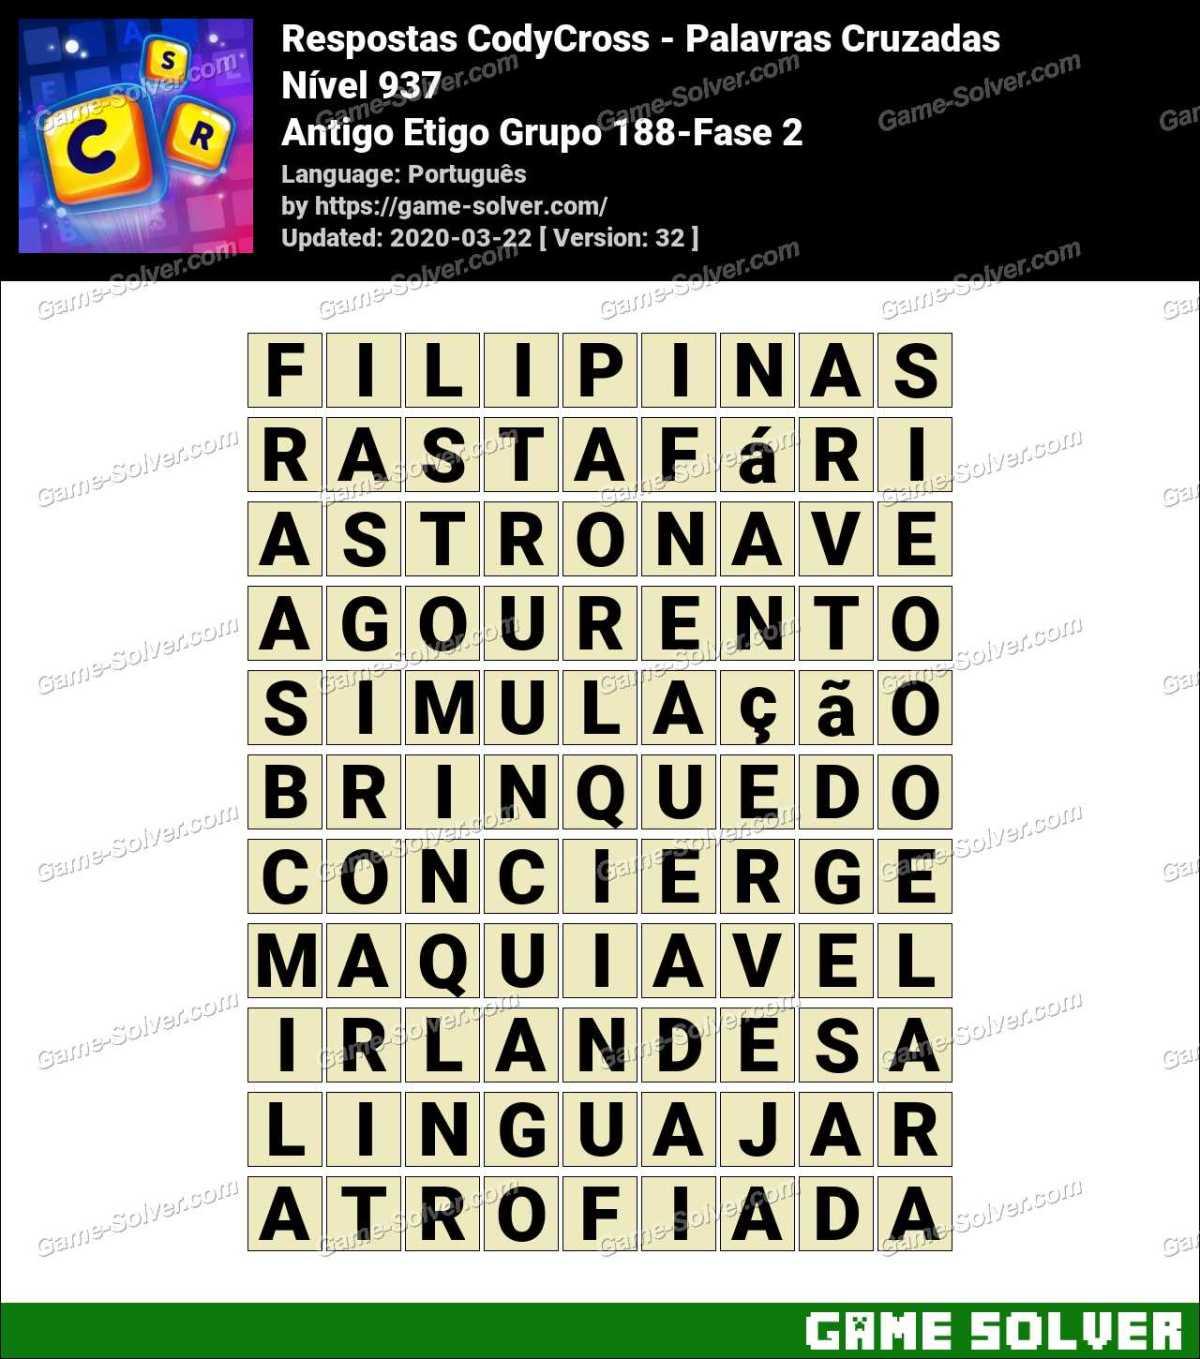 Respostas CodyCross Antigo Etigo Grupo 188-Fase 2